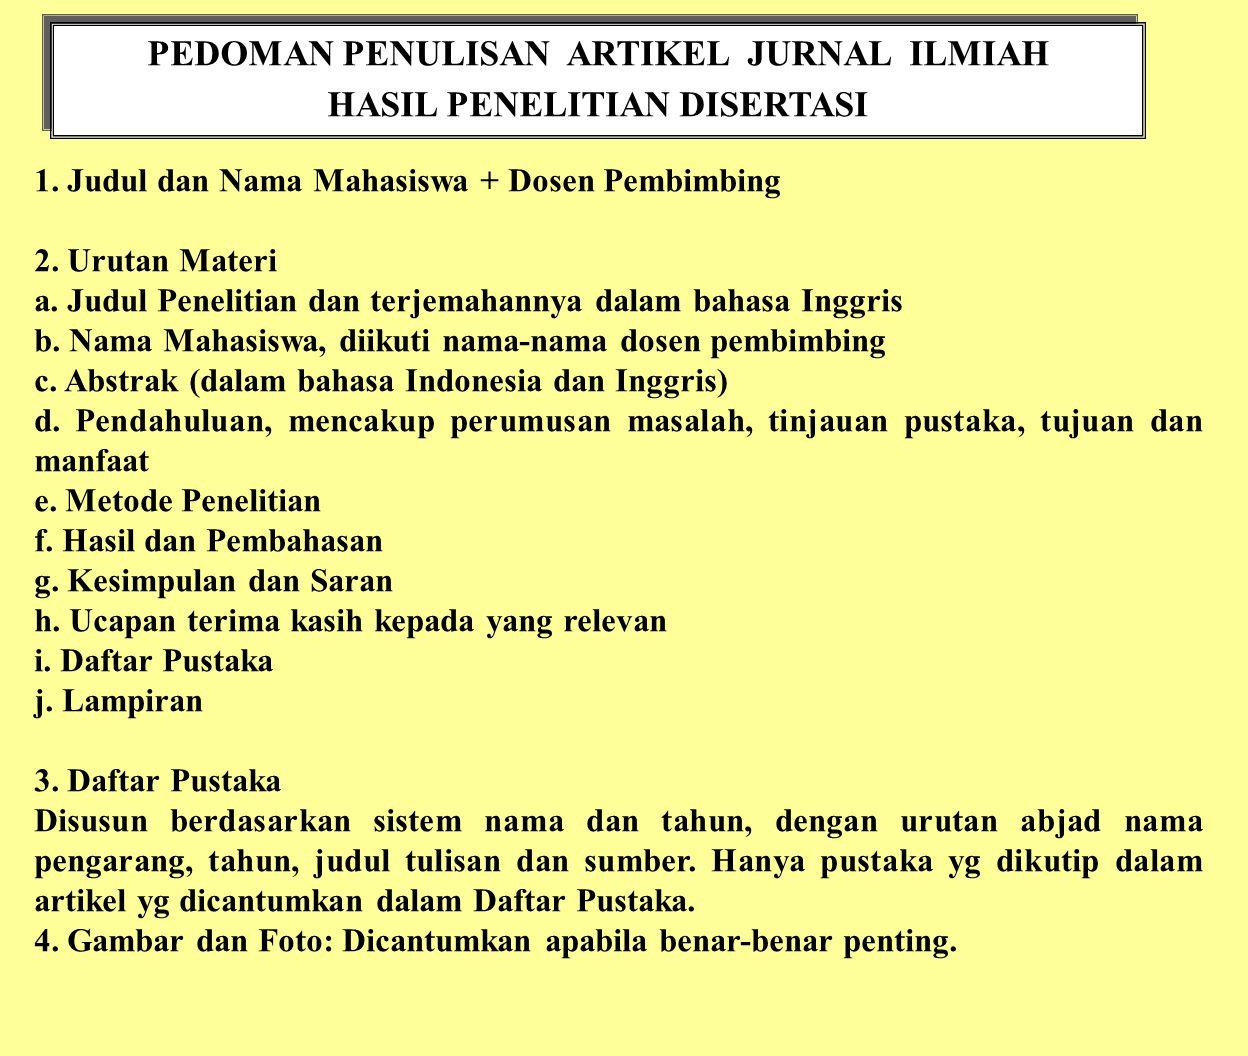 PEDOMAN PENULISAN ARTIKEL JURNAL ILMIAH HASIL PENELITIAN DISERTASI PEDOMAN PENULISAN ARTIKEL JURNAL ILMIAH HASIL PENELITIAN DISERTASI 1. Judul dan Nam